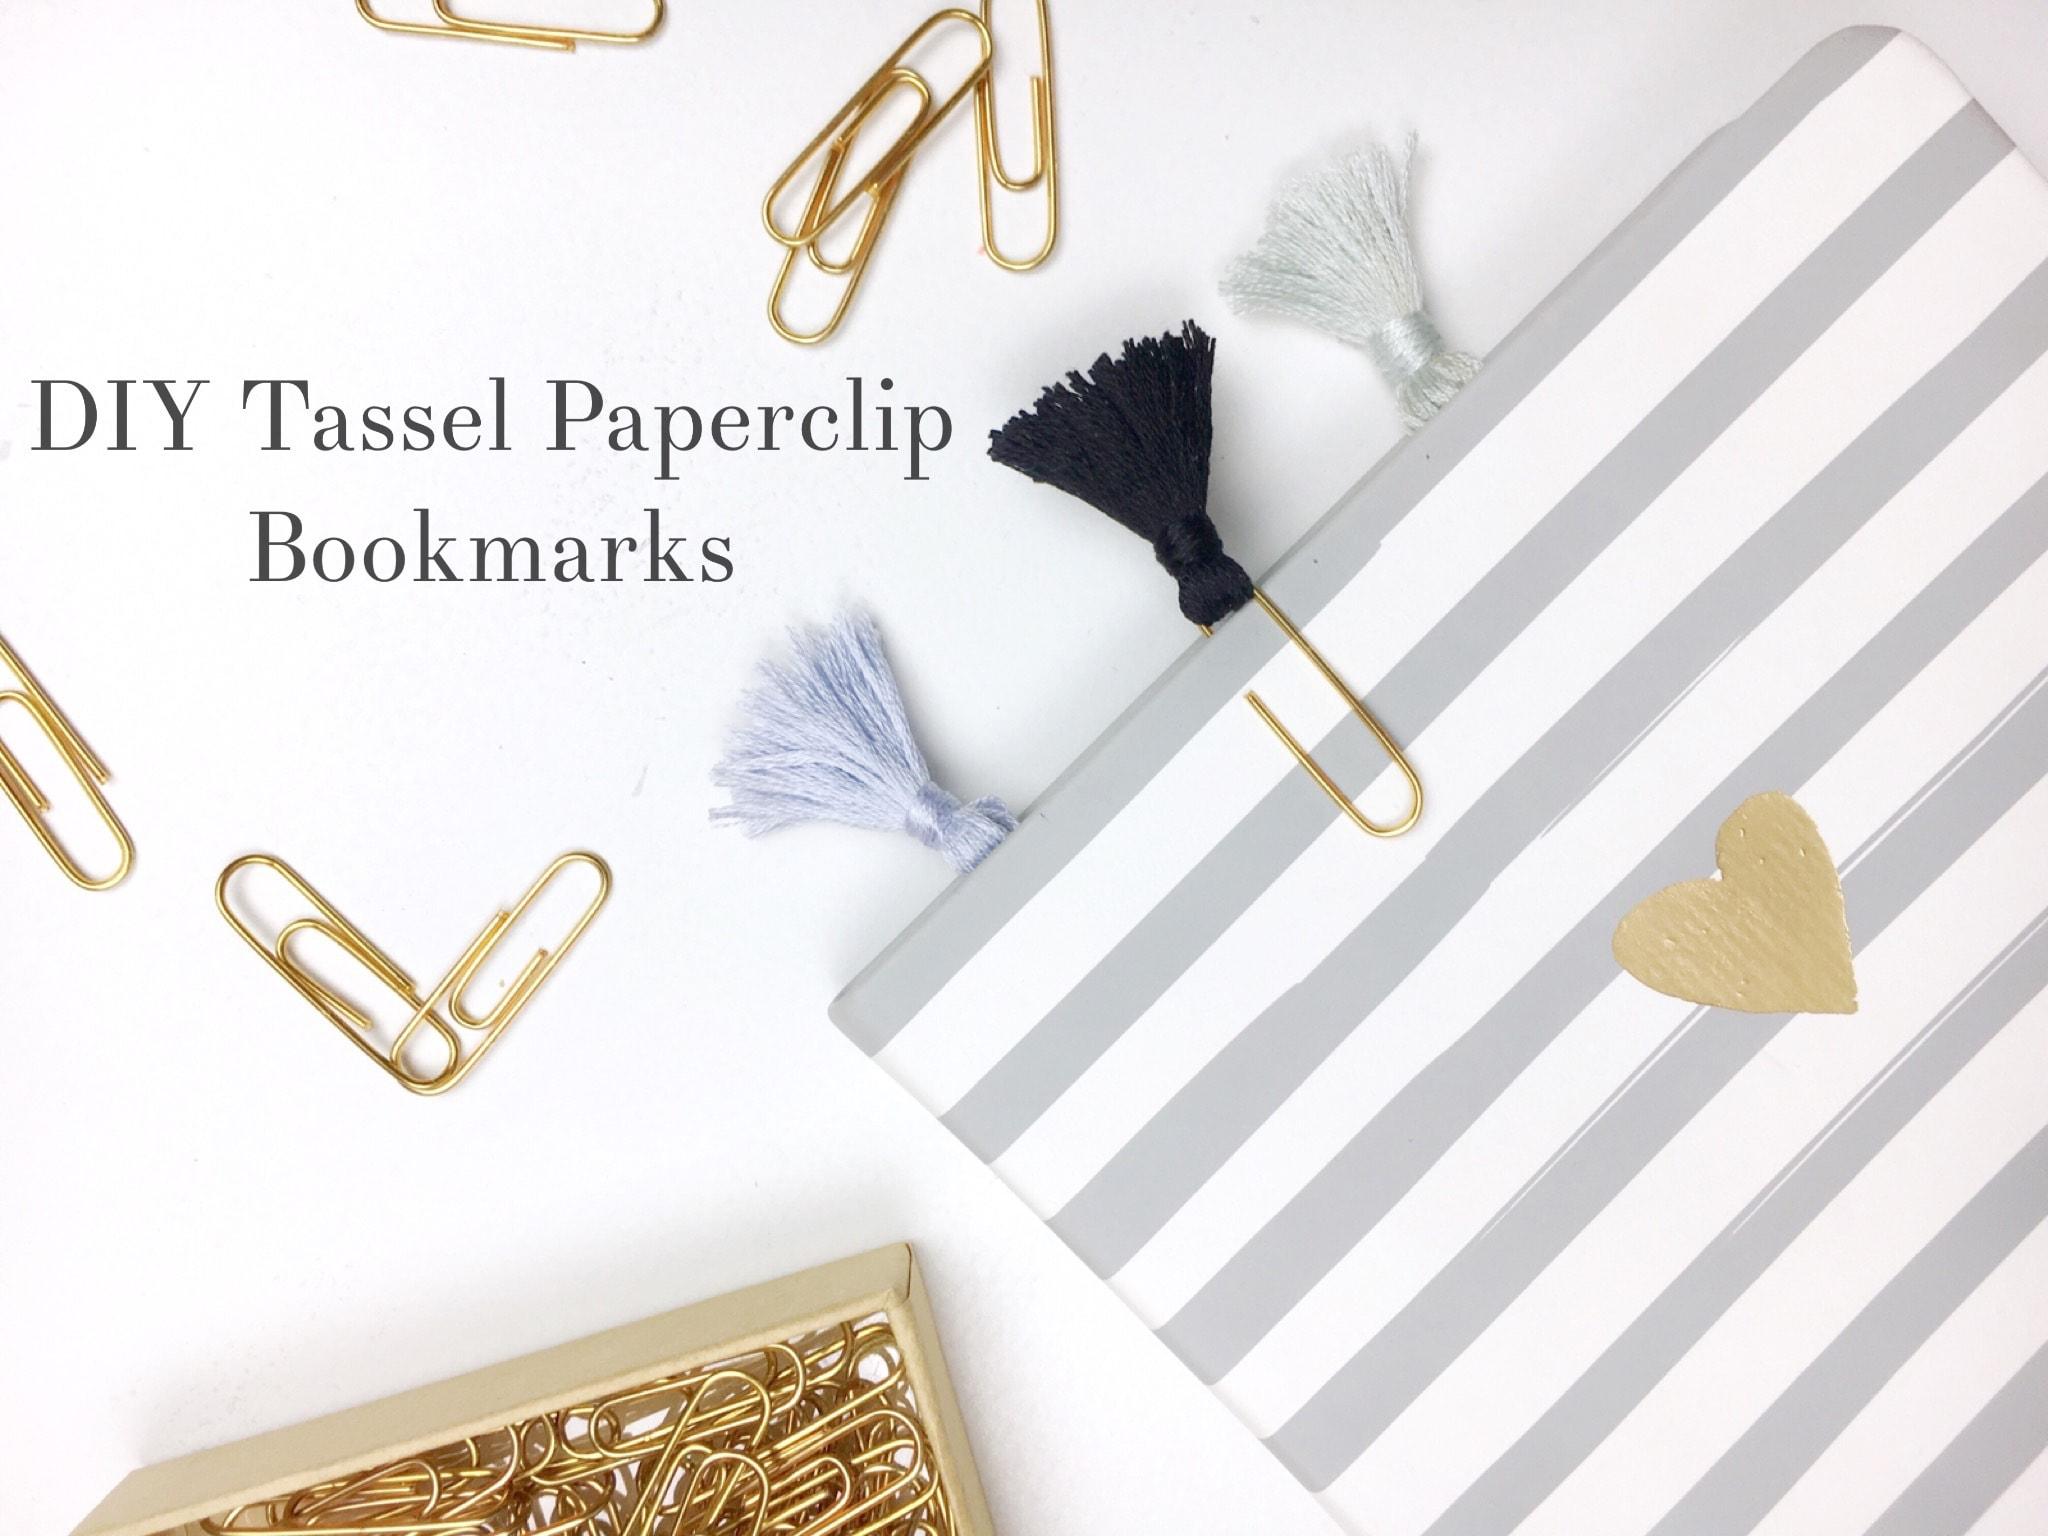 DIY Tassel Paperclip Bookmarks